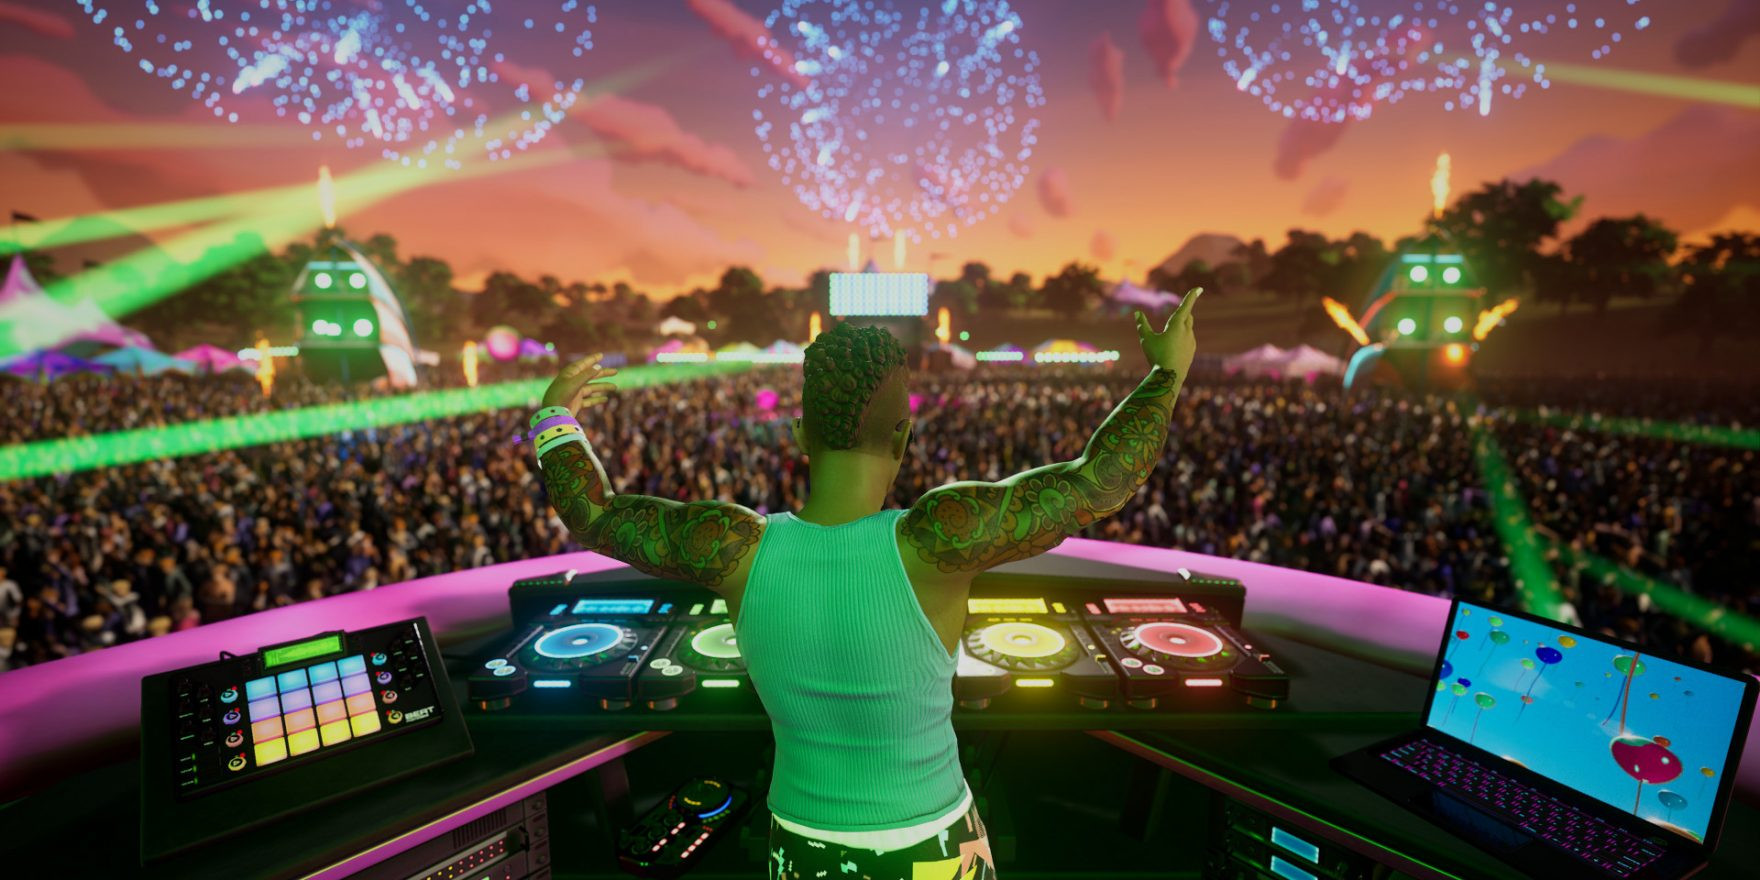 Sei dein eigener DJ